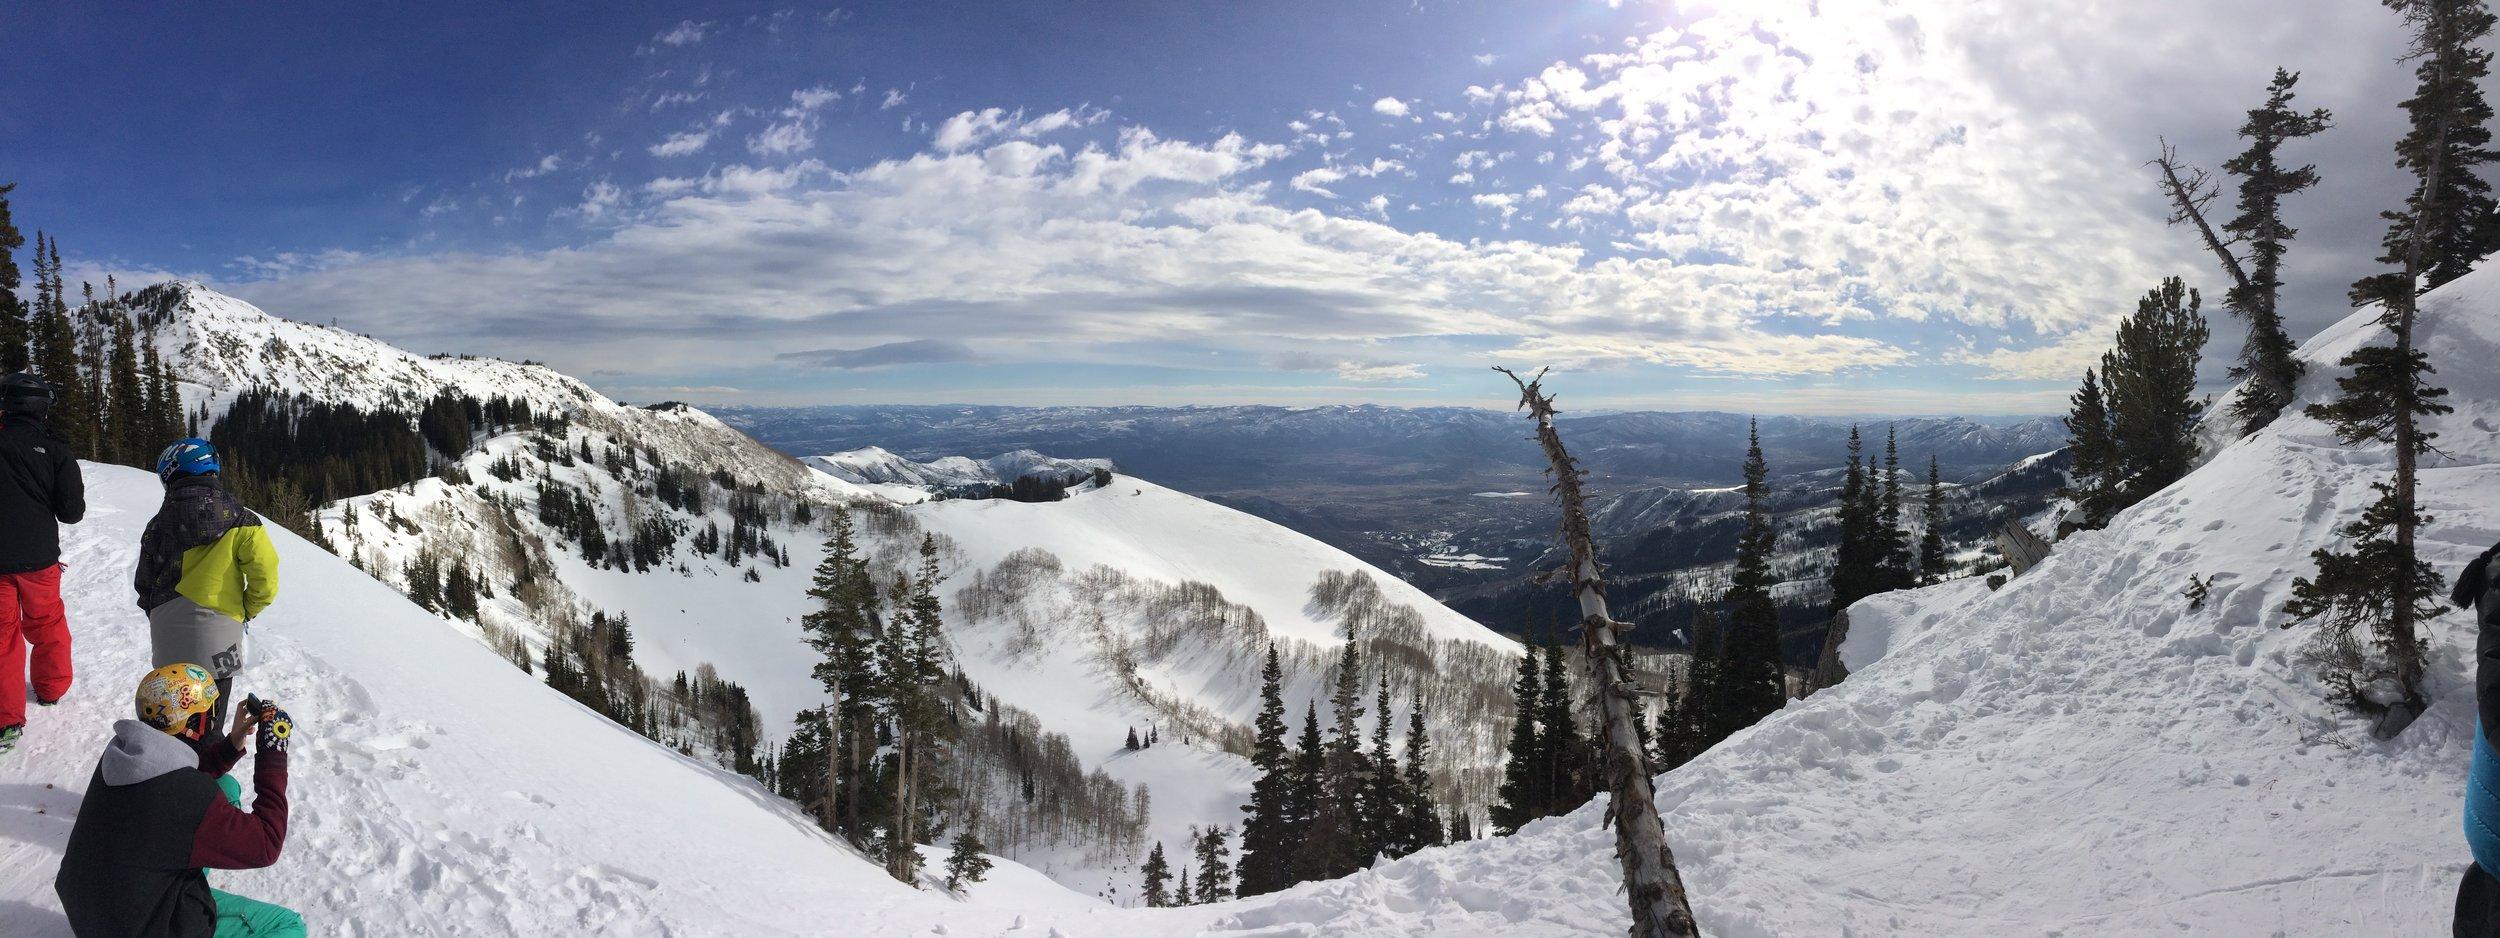 great view from brighton ski resort